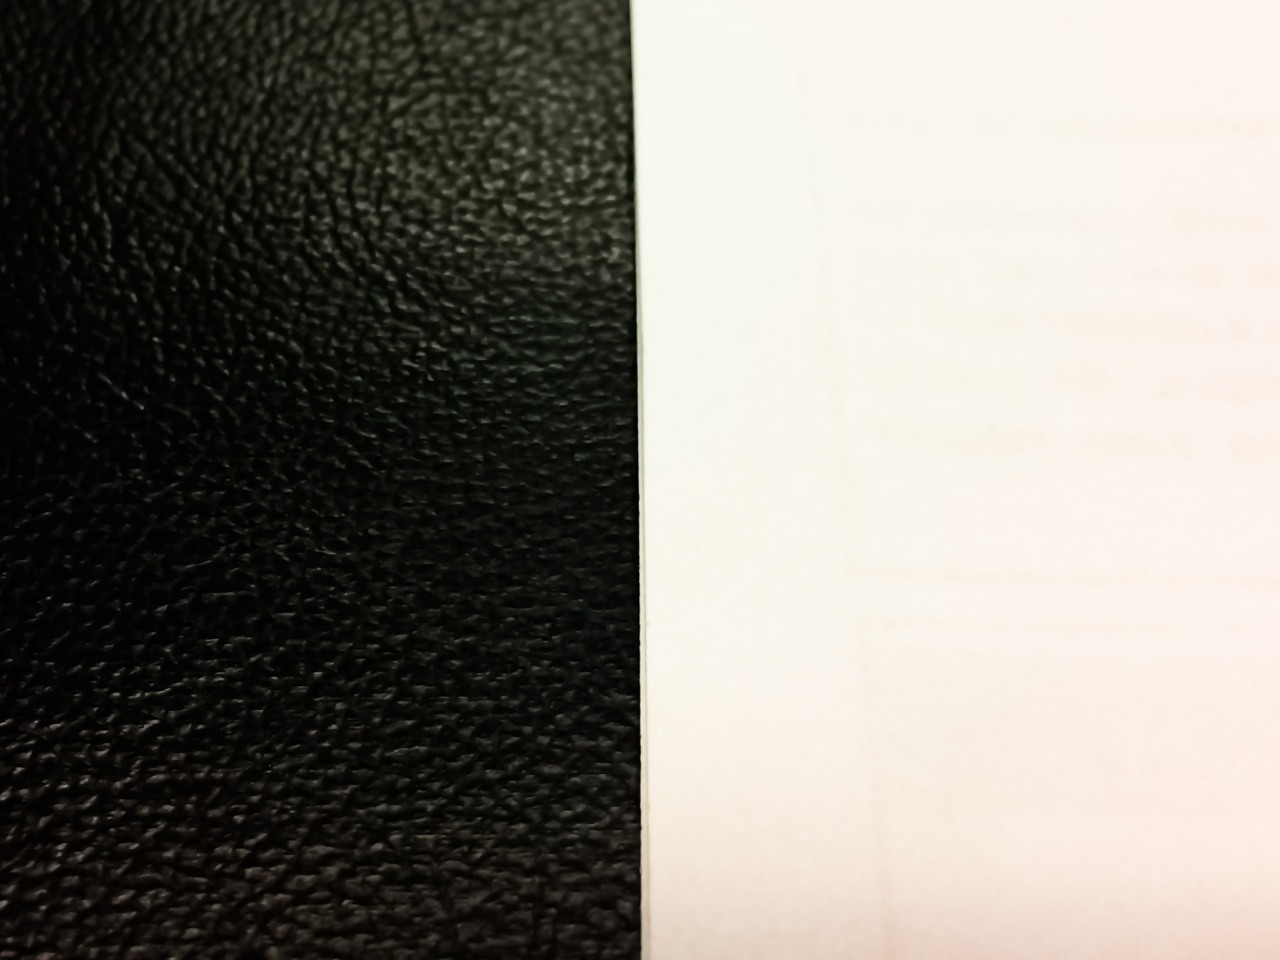 Imago Reflections – Genesis 1:27 – Grey/Black/White